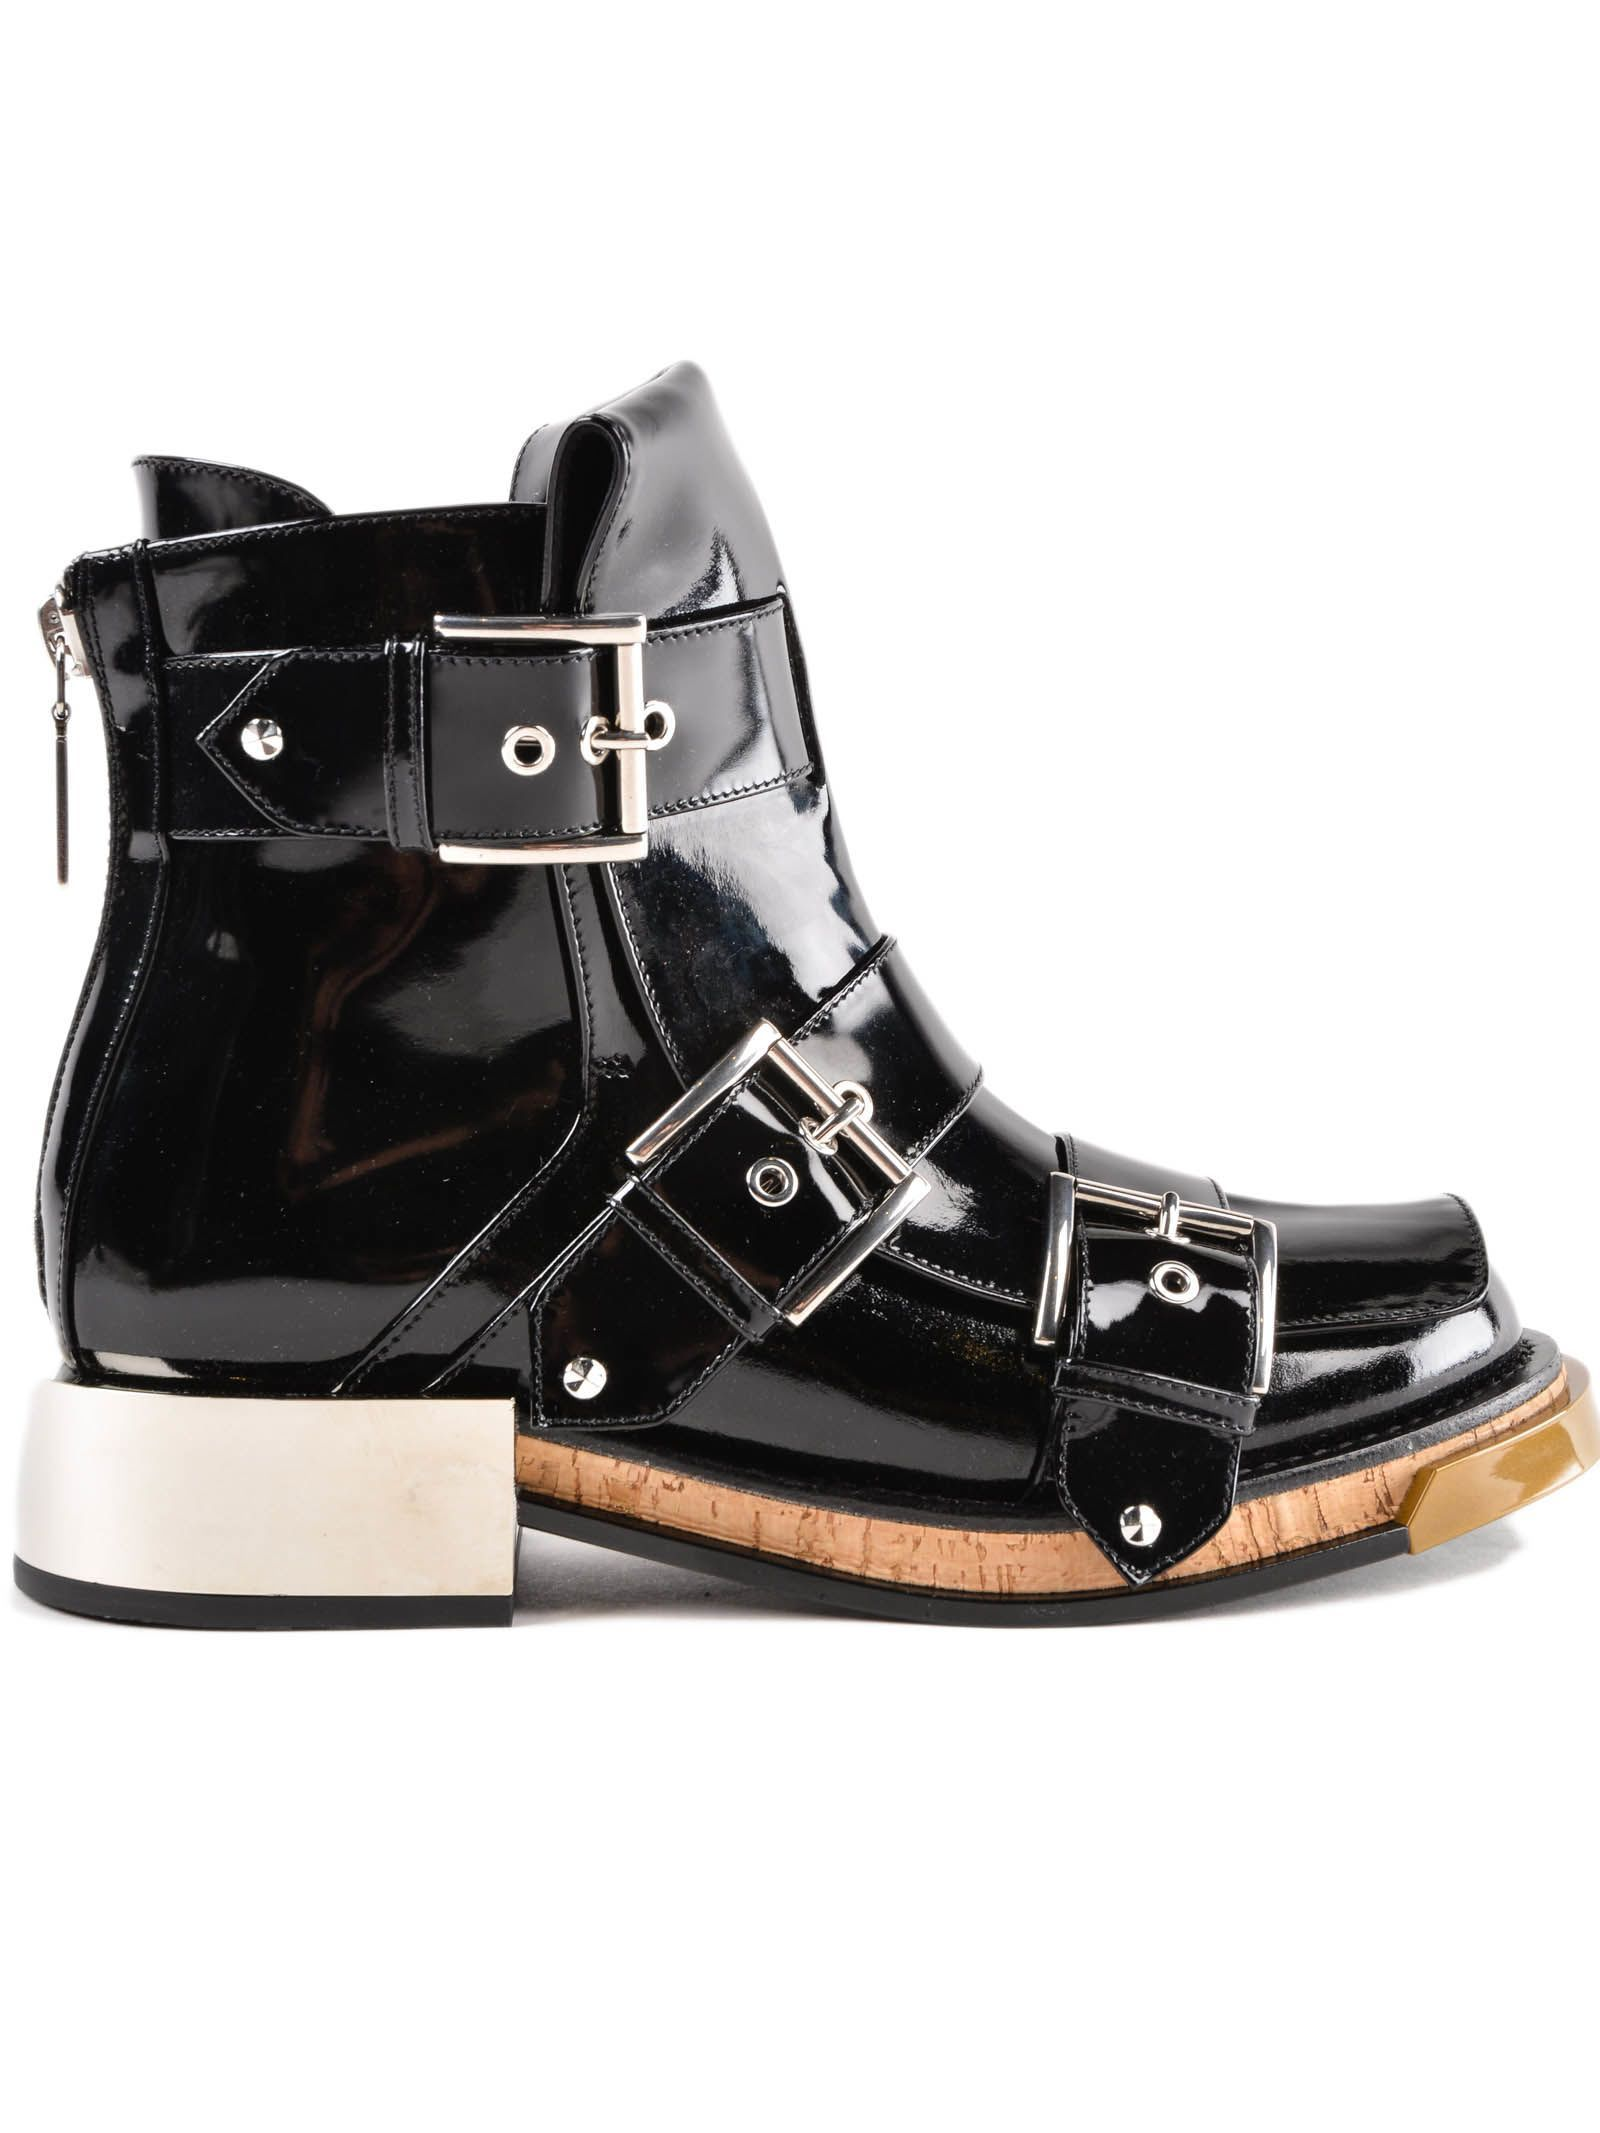 ALEXANDER MCQUEEN | Alexander McQueen Alexander McQueen Biker Boot #Shoes  #Boots #ALEXANDER MCQUEEN